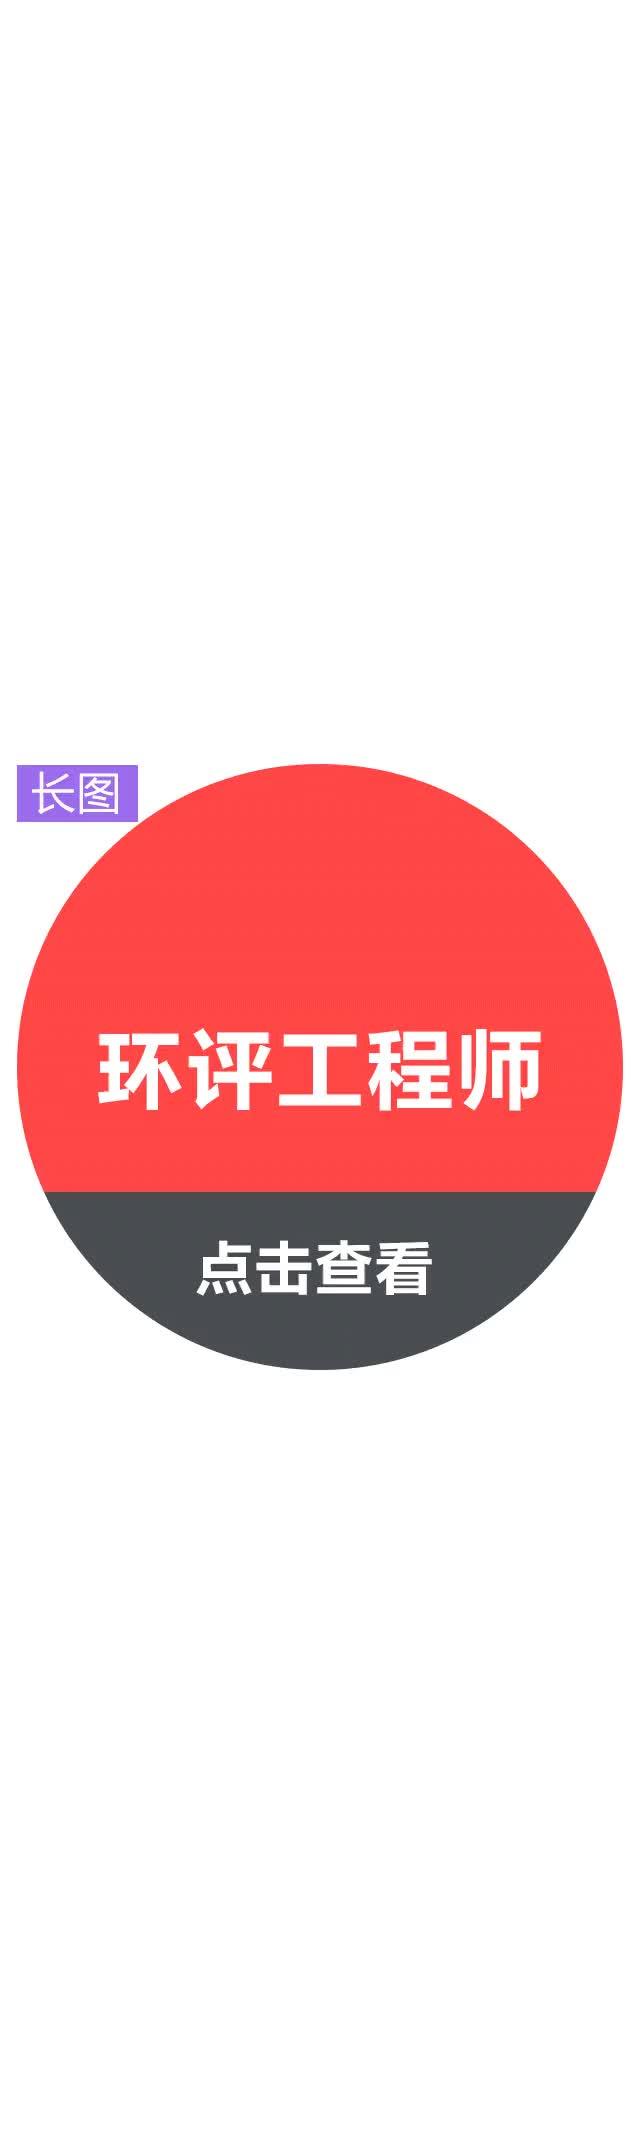 Watch and share 九宫格 注册环评工程师 animated stickers on Gfycat